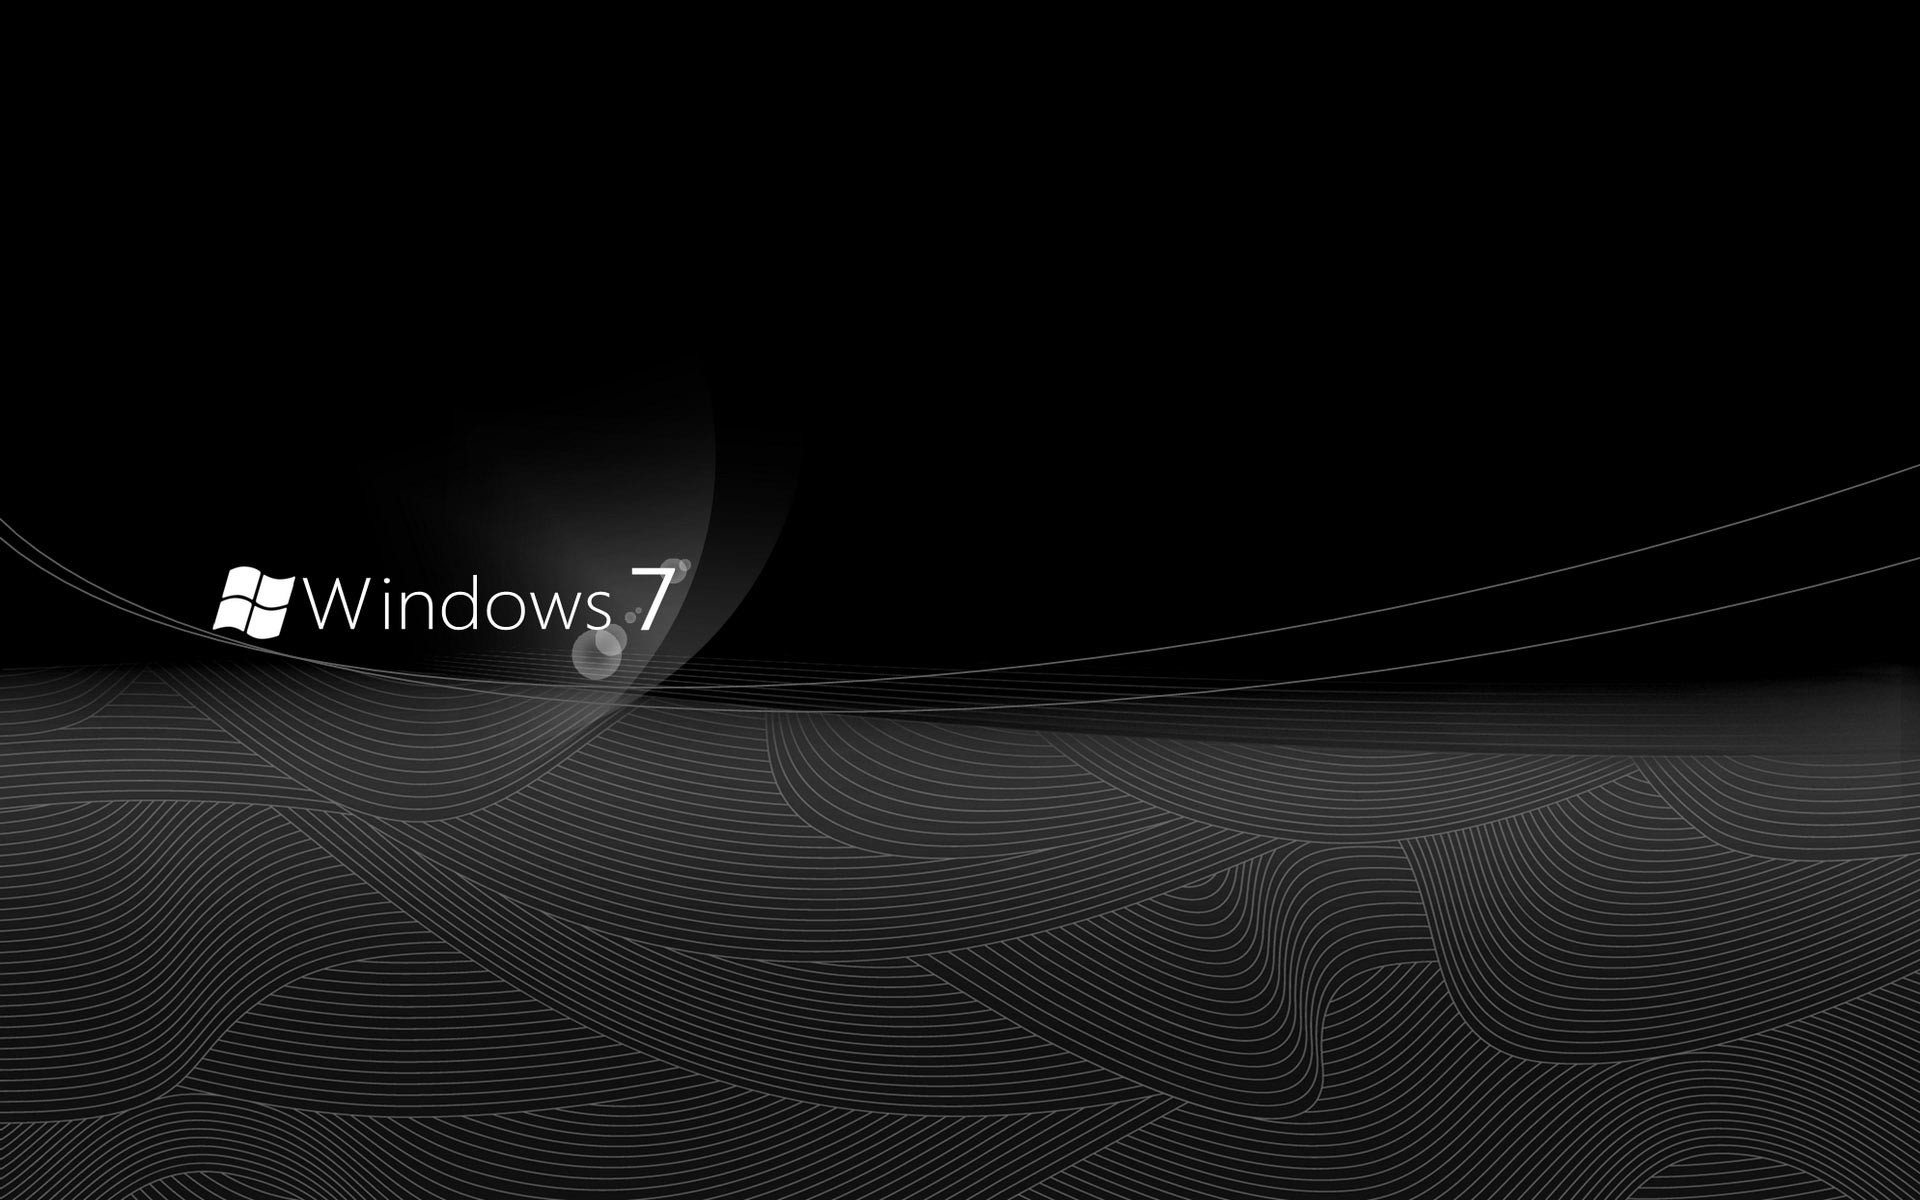 Wallpaper windows, background, Windows , black images for desktop Windows 8 Black  Wallpapers